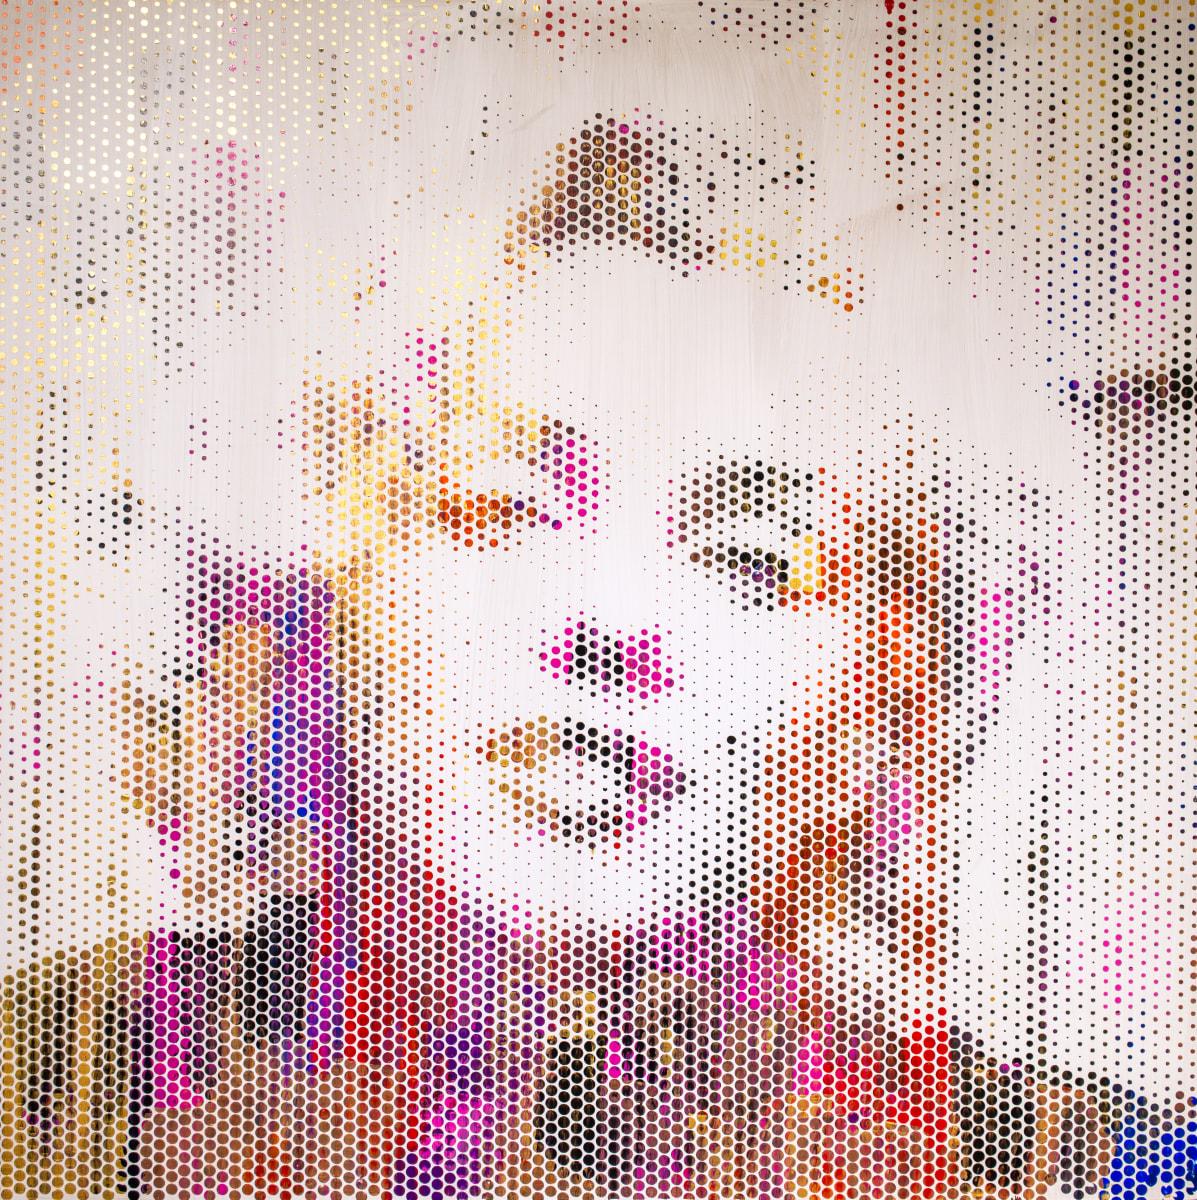 Marilyn Monroe II by Sean Christopher Ward